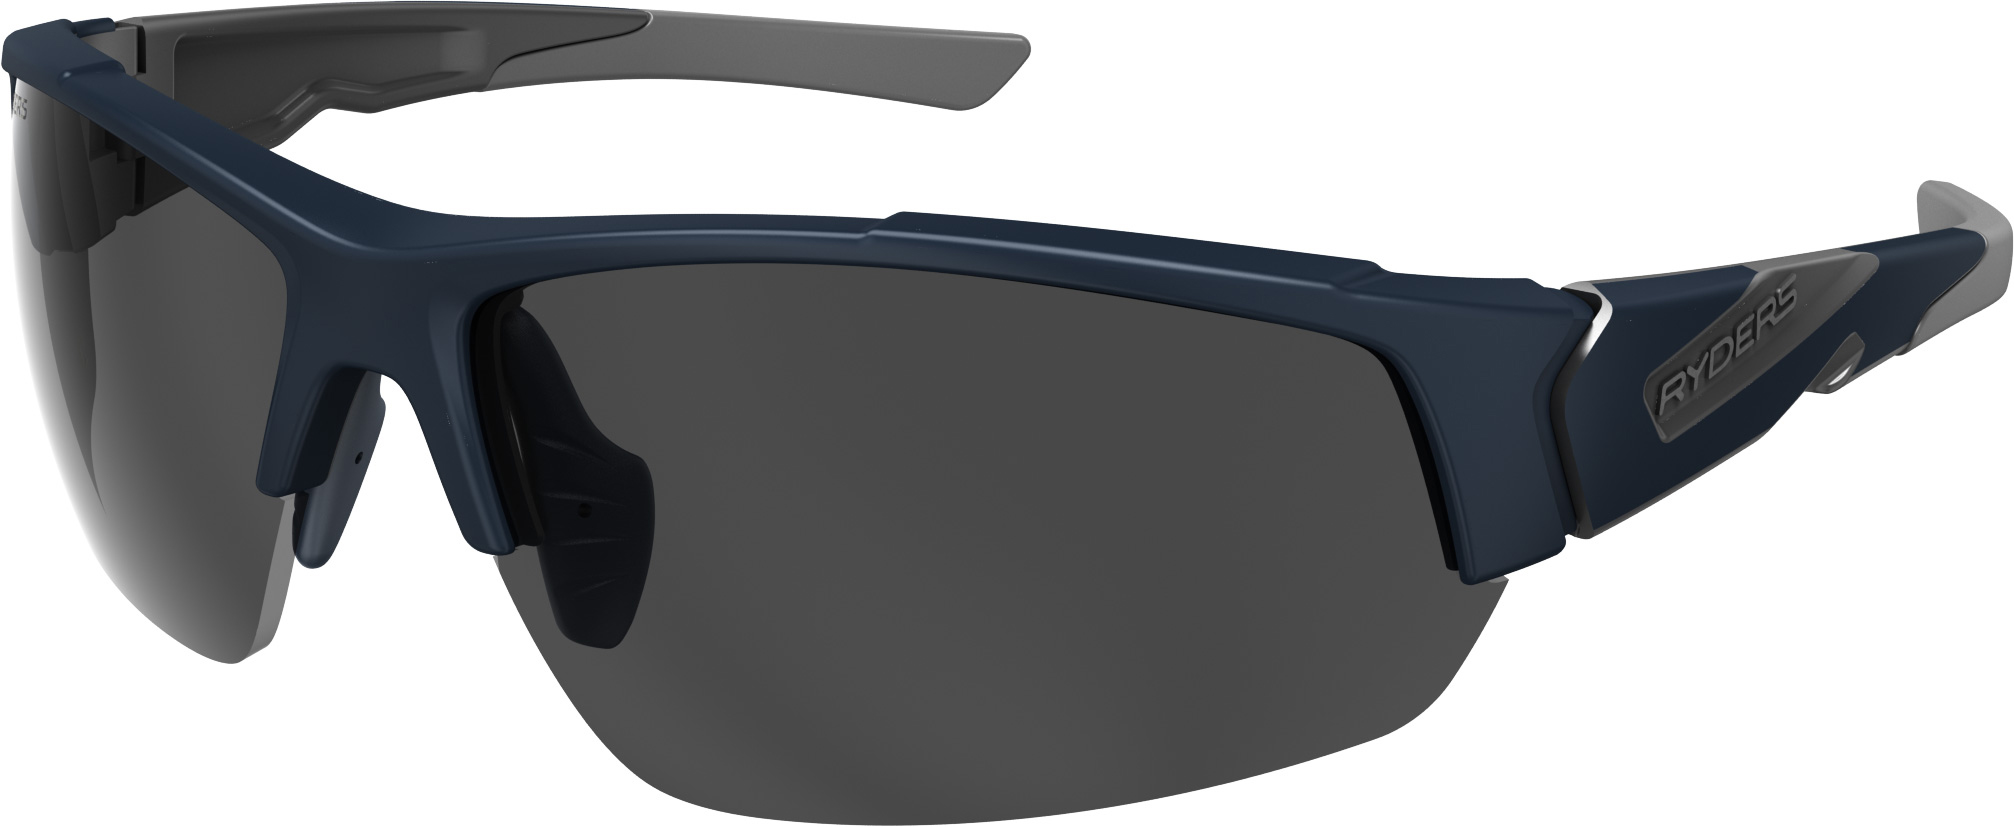 c9ebd33bfa1 Ryders Eyewear Strider Sunglasses - Unisex